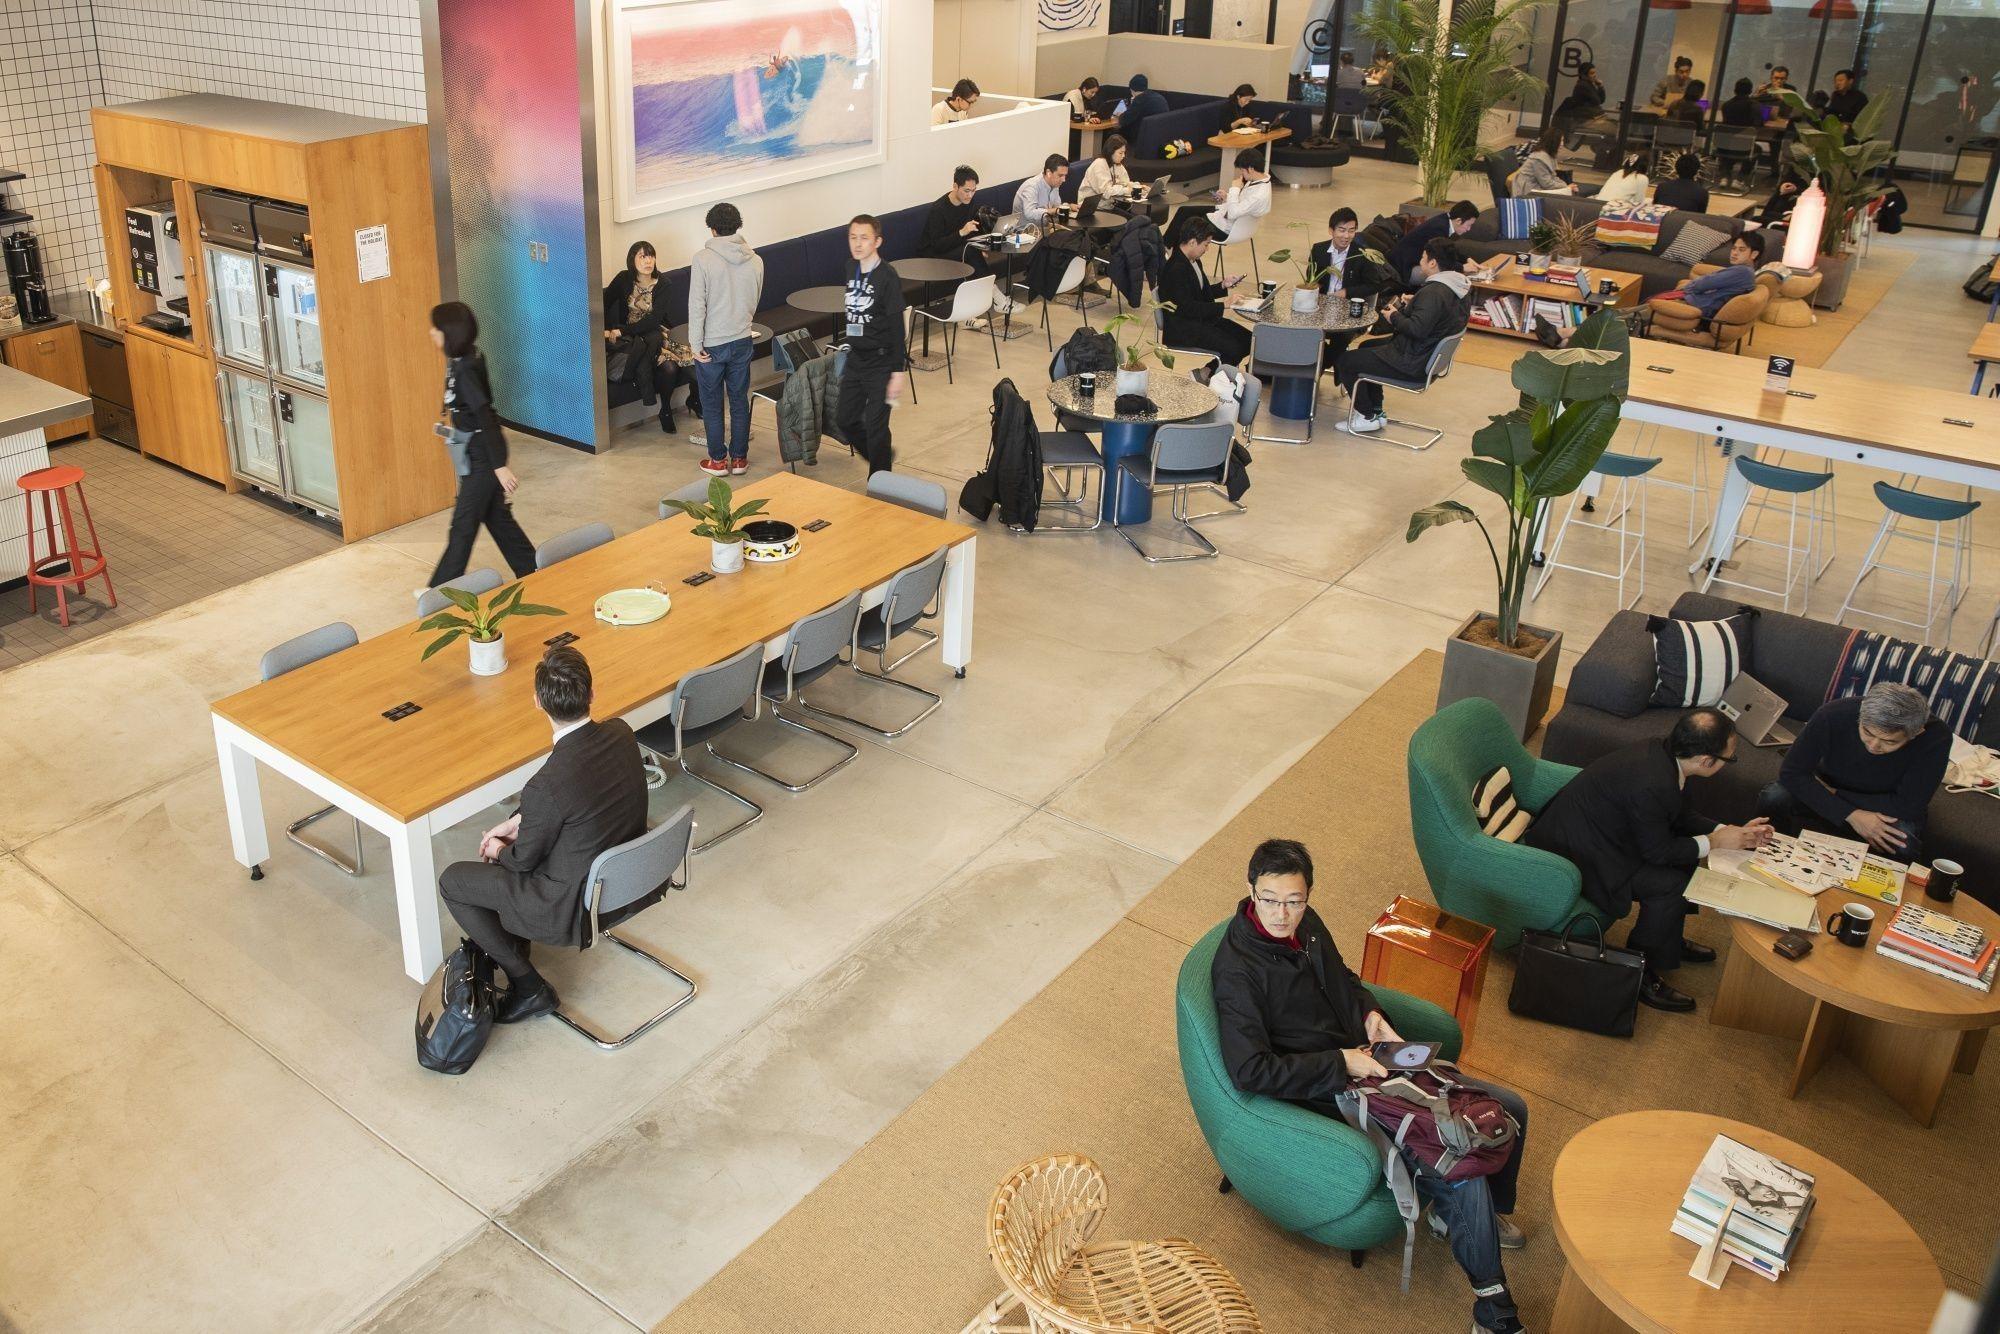 Inside WeWork's Iceberg Co-Working Space in Tokyo